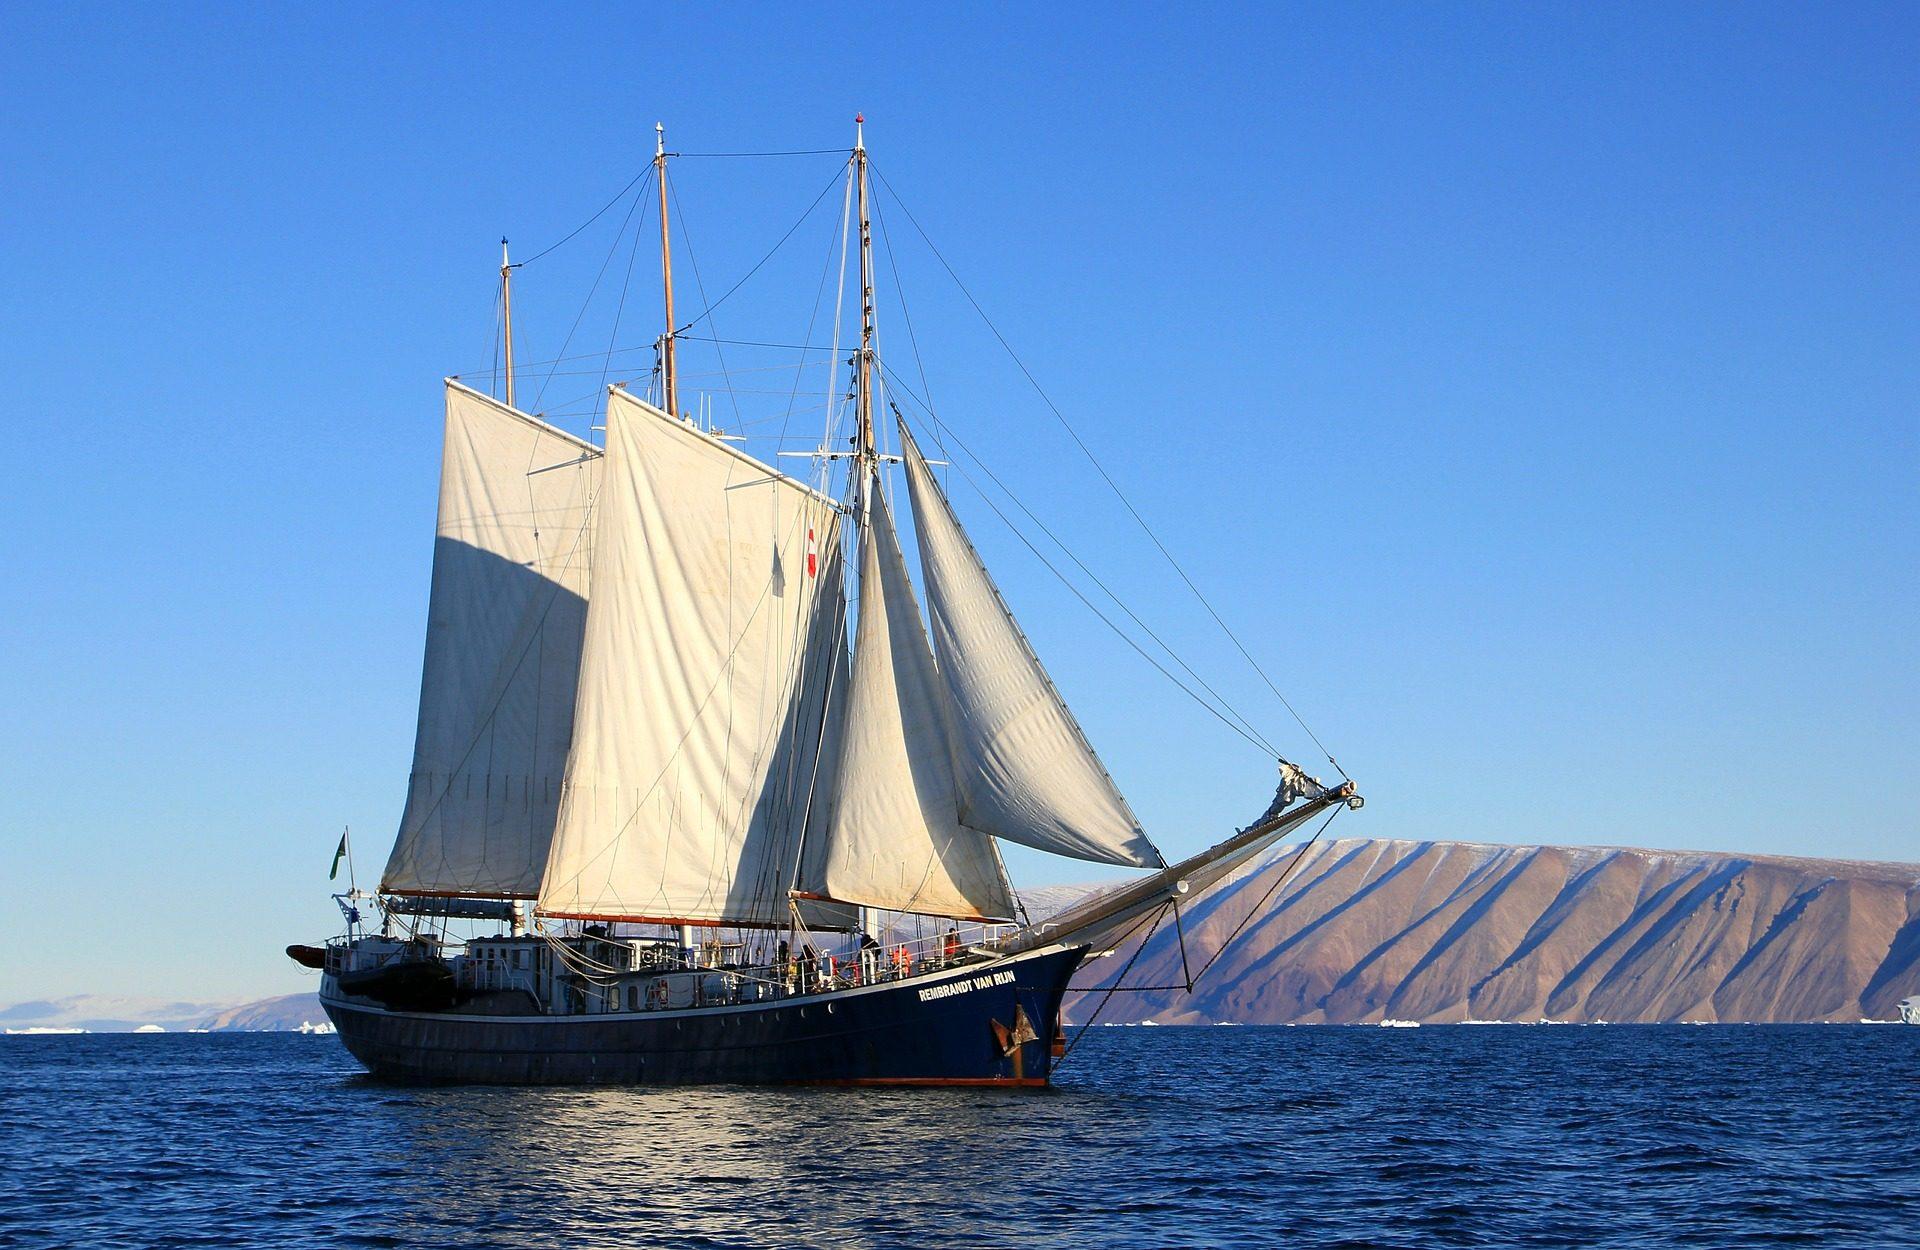 velero, नाव, navío, महासागर, सागर - HD वॉलपेपर - प्रोफेसर-falken.com